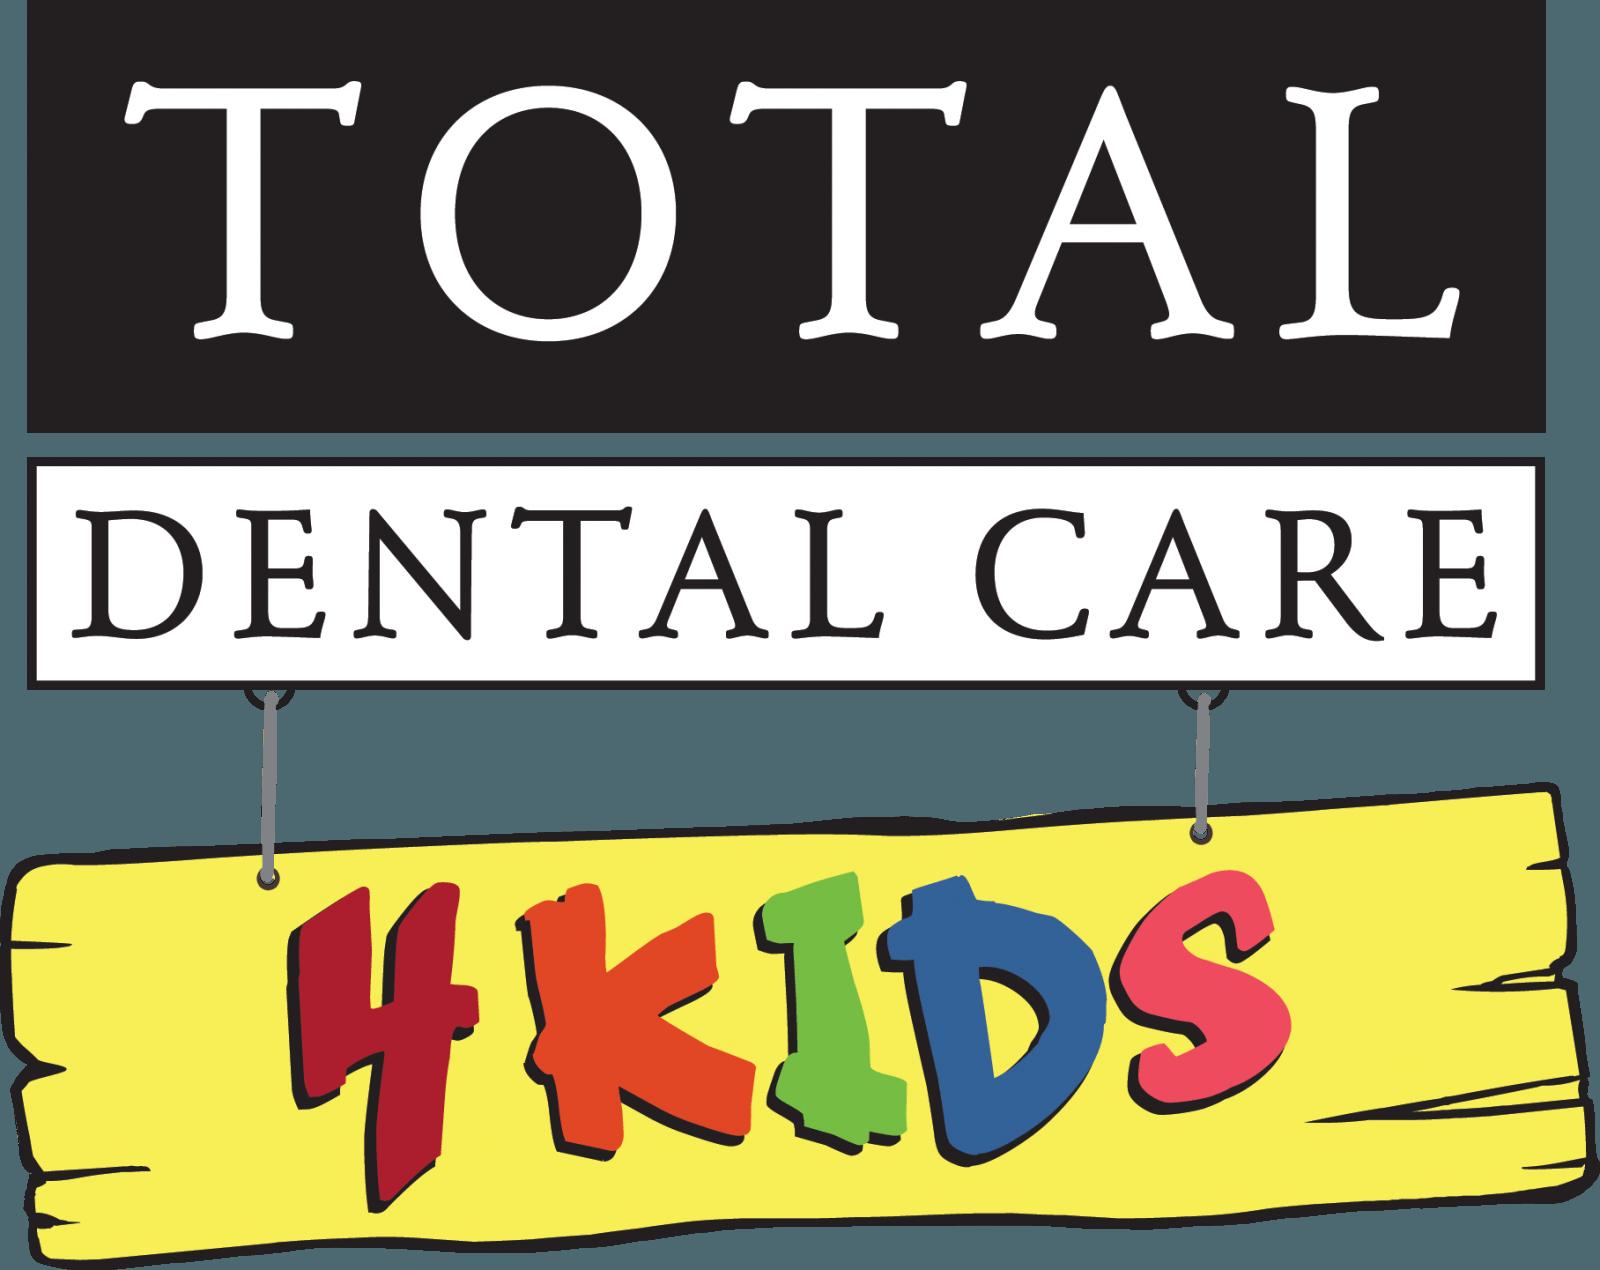 Total Dental Care - 4Kids Logo